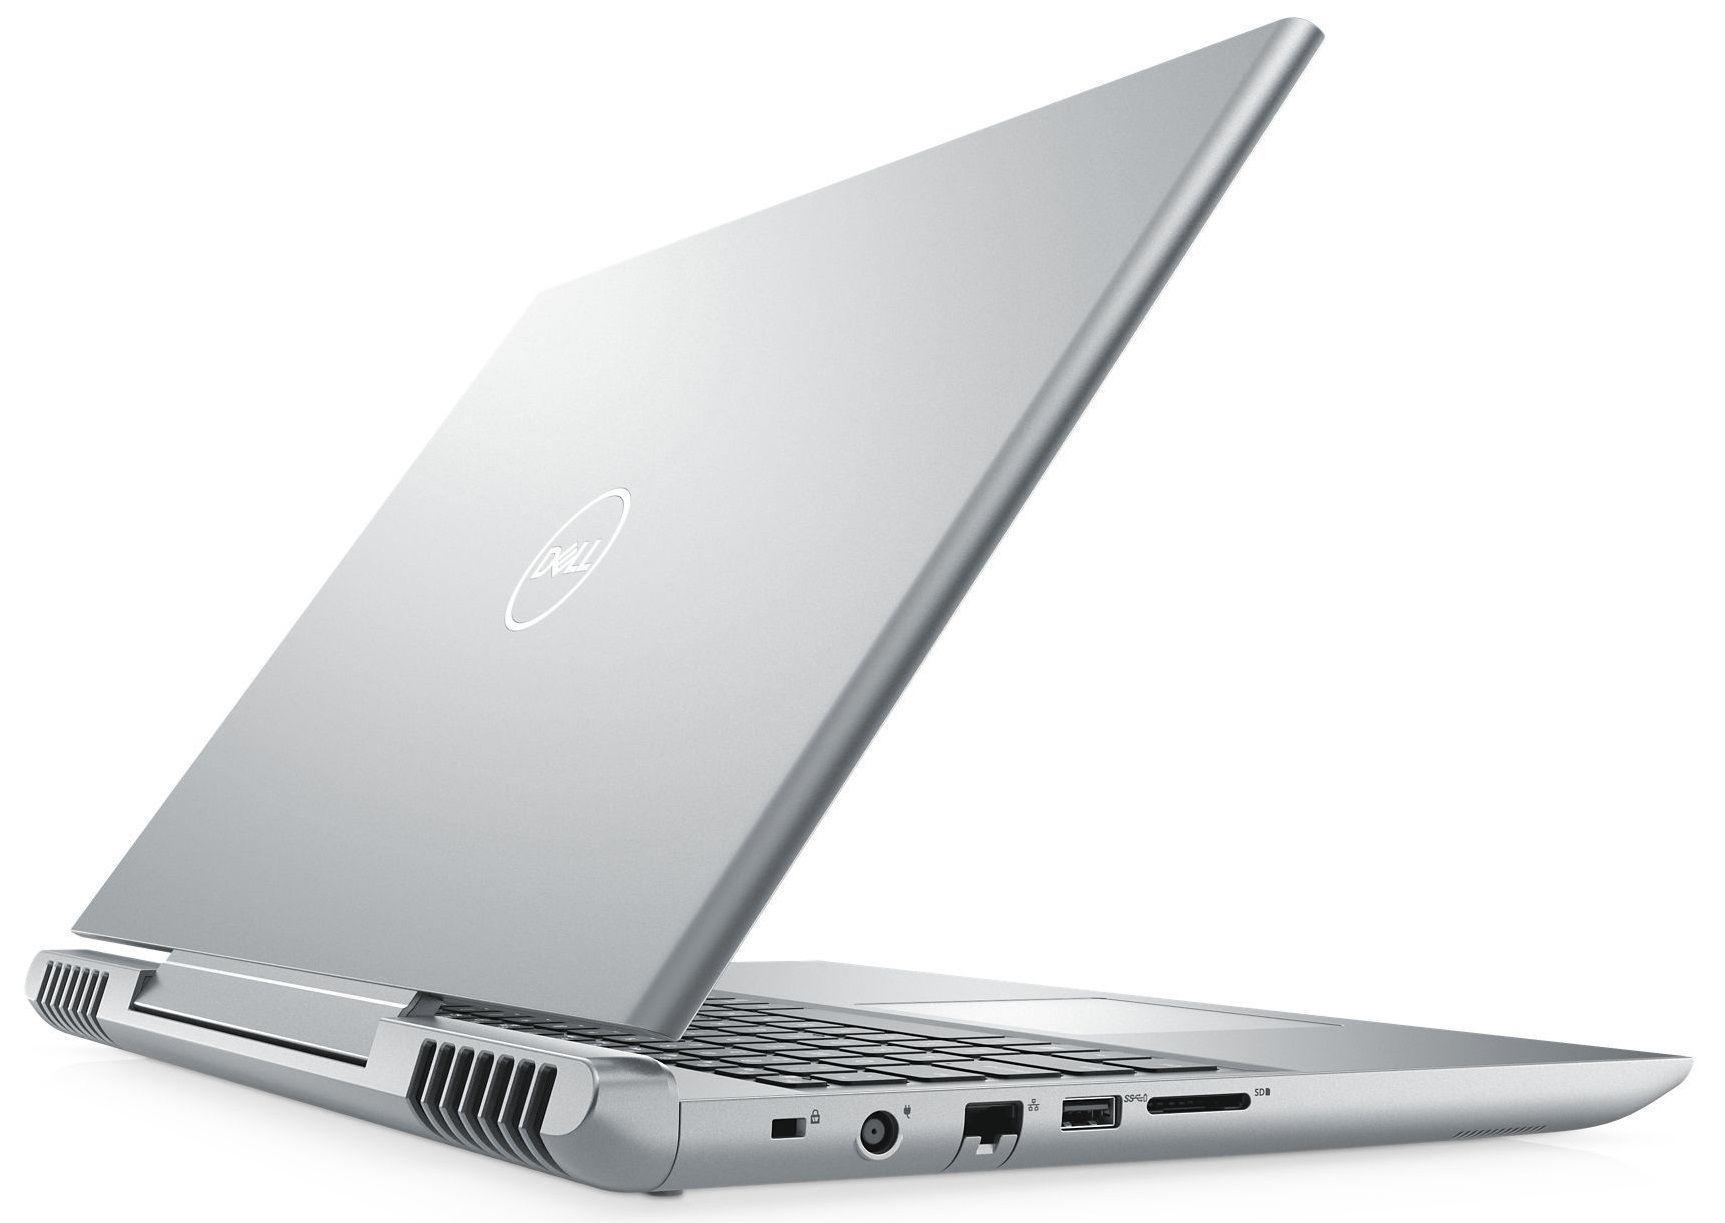 Лаптоп Dell Vostro 7580 - N3403VN7580EMEA01 - 3